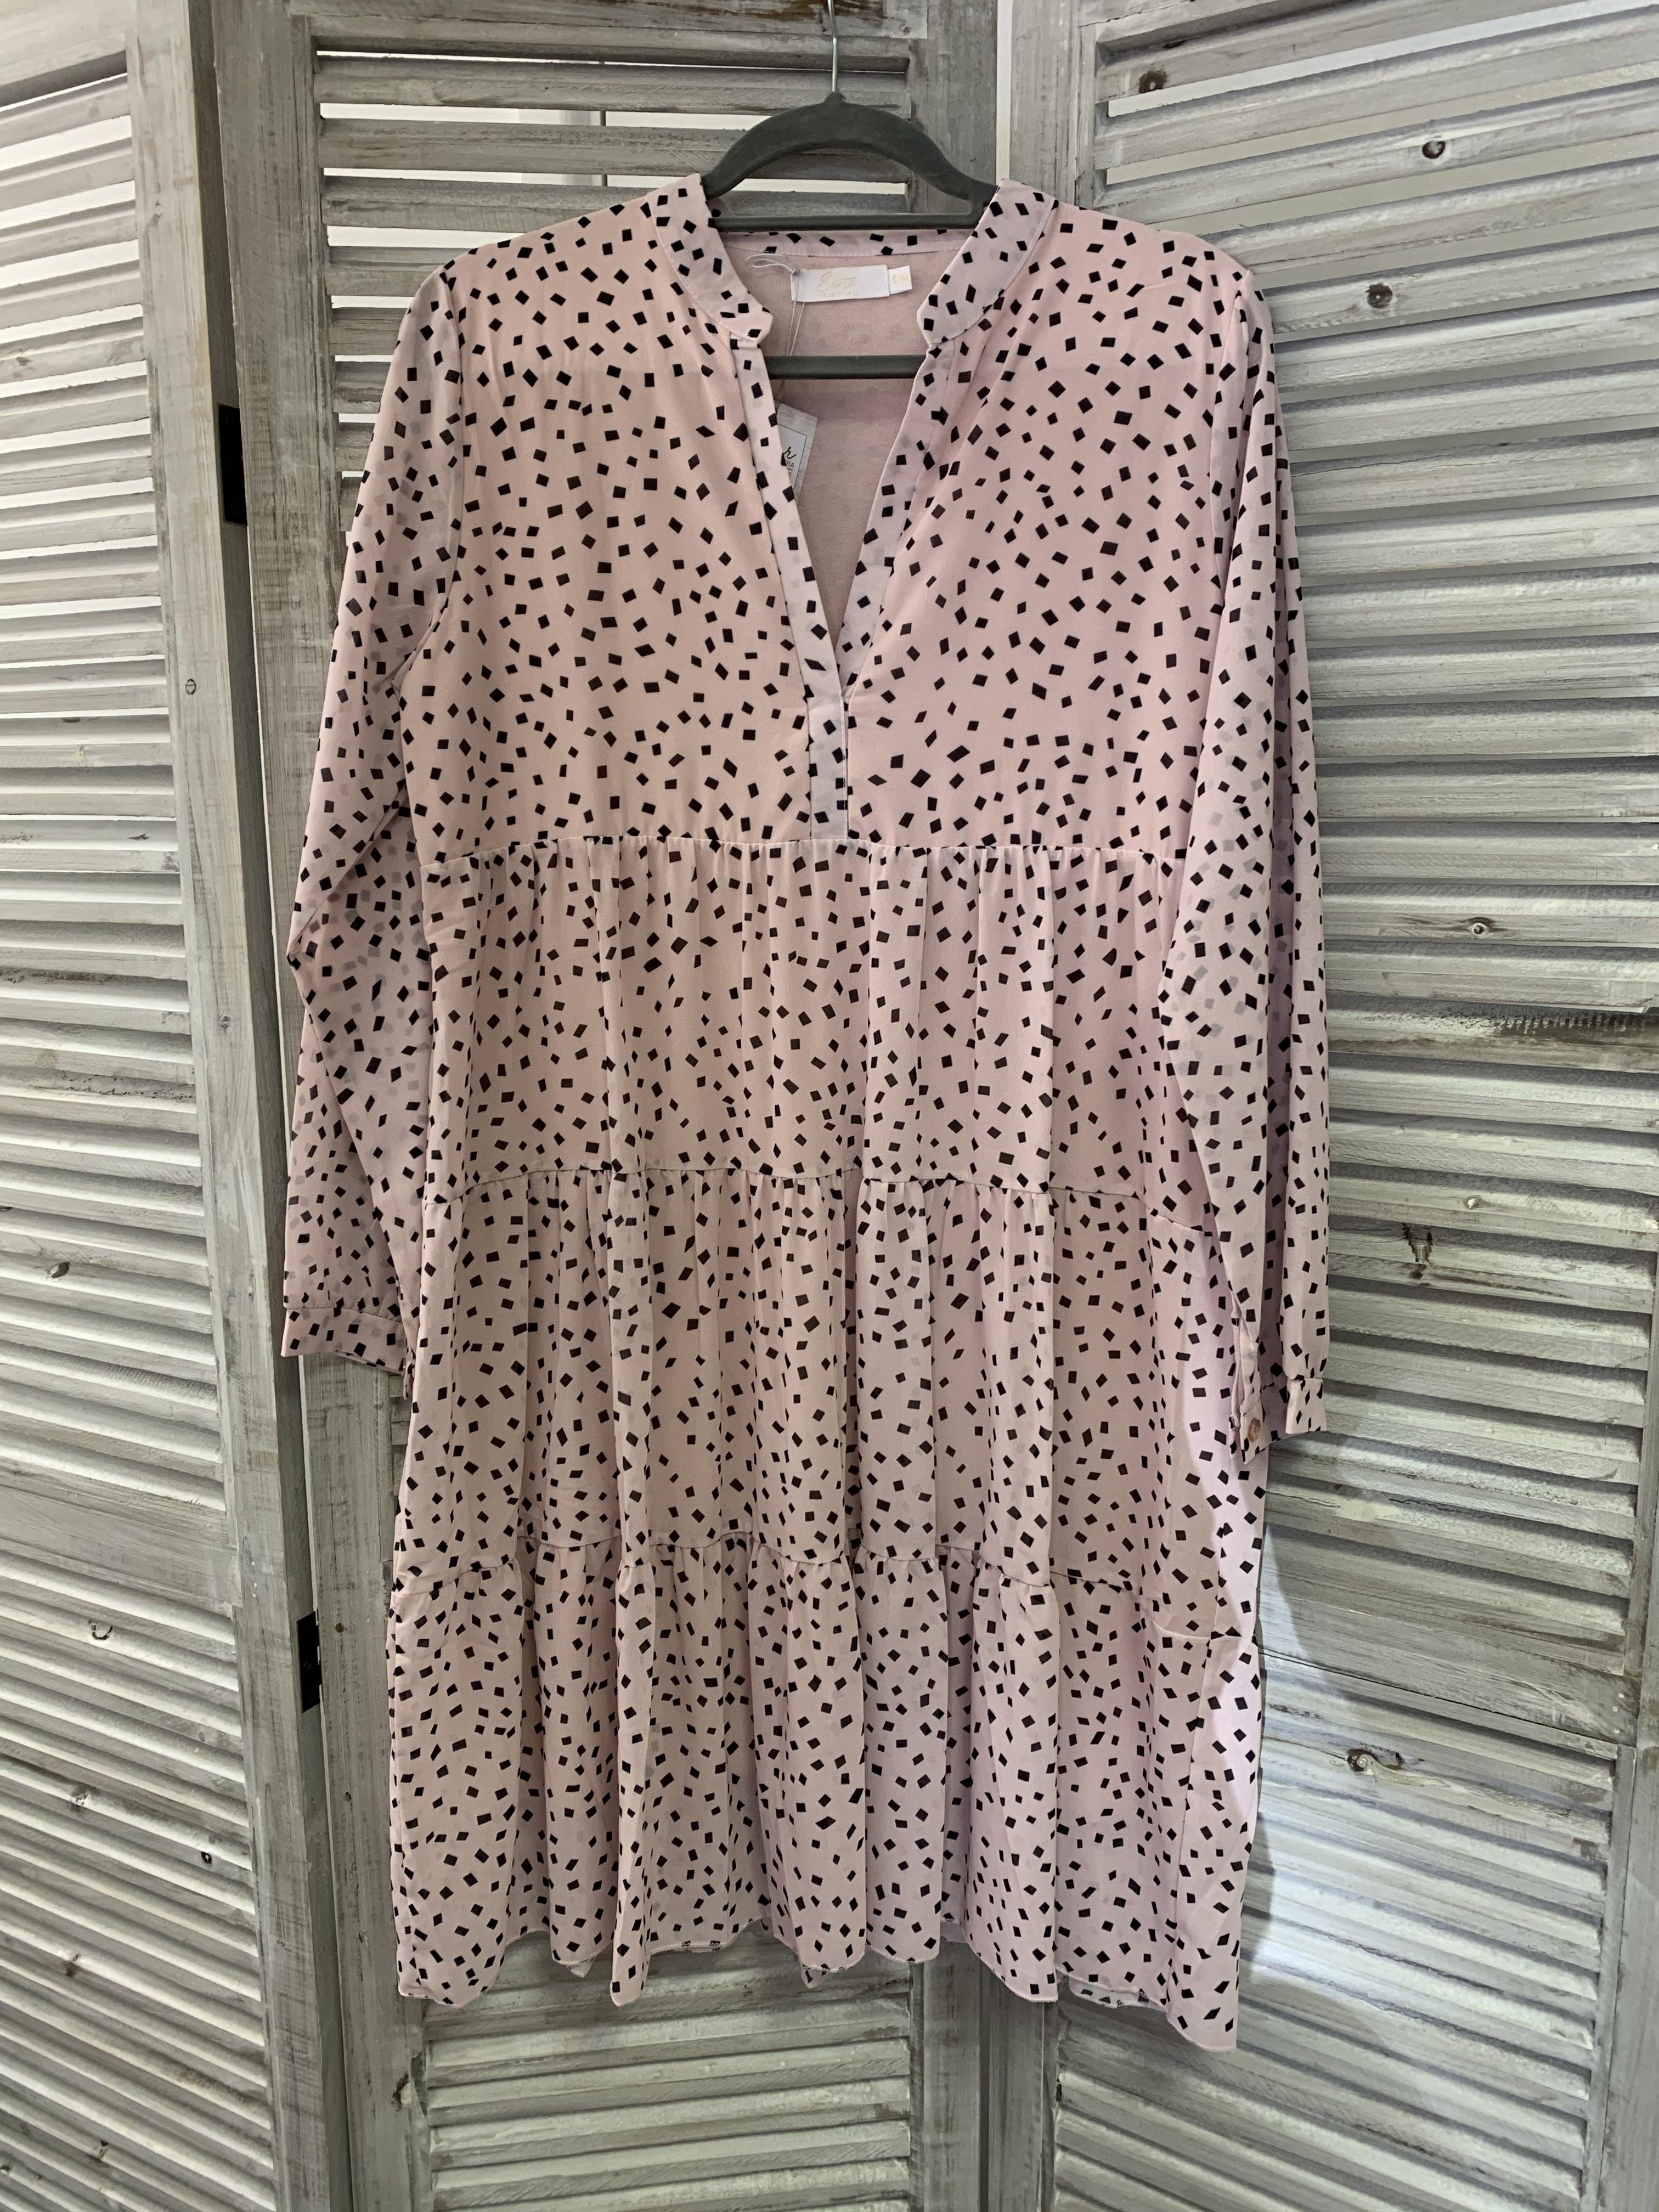 Geometric Print Tiered Dress Size 6-12 - Pink